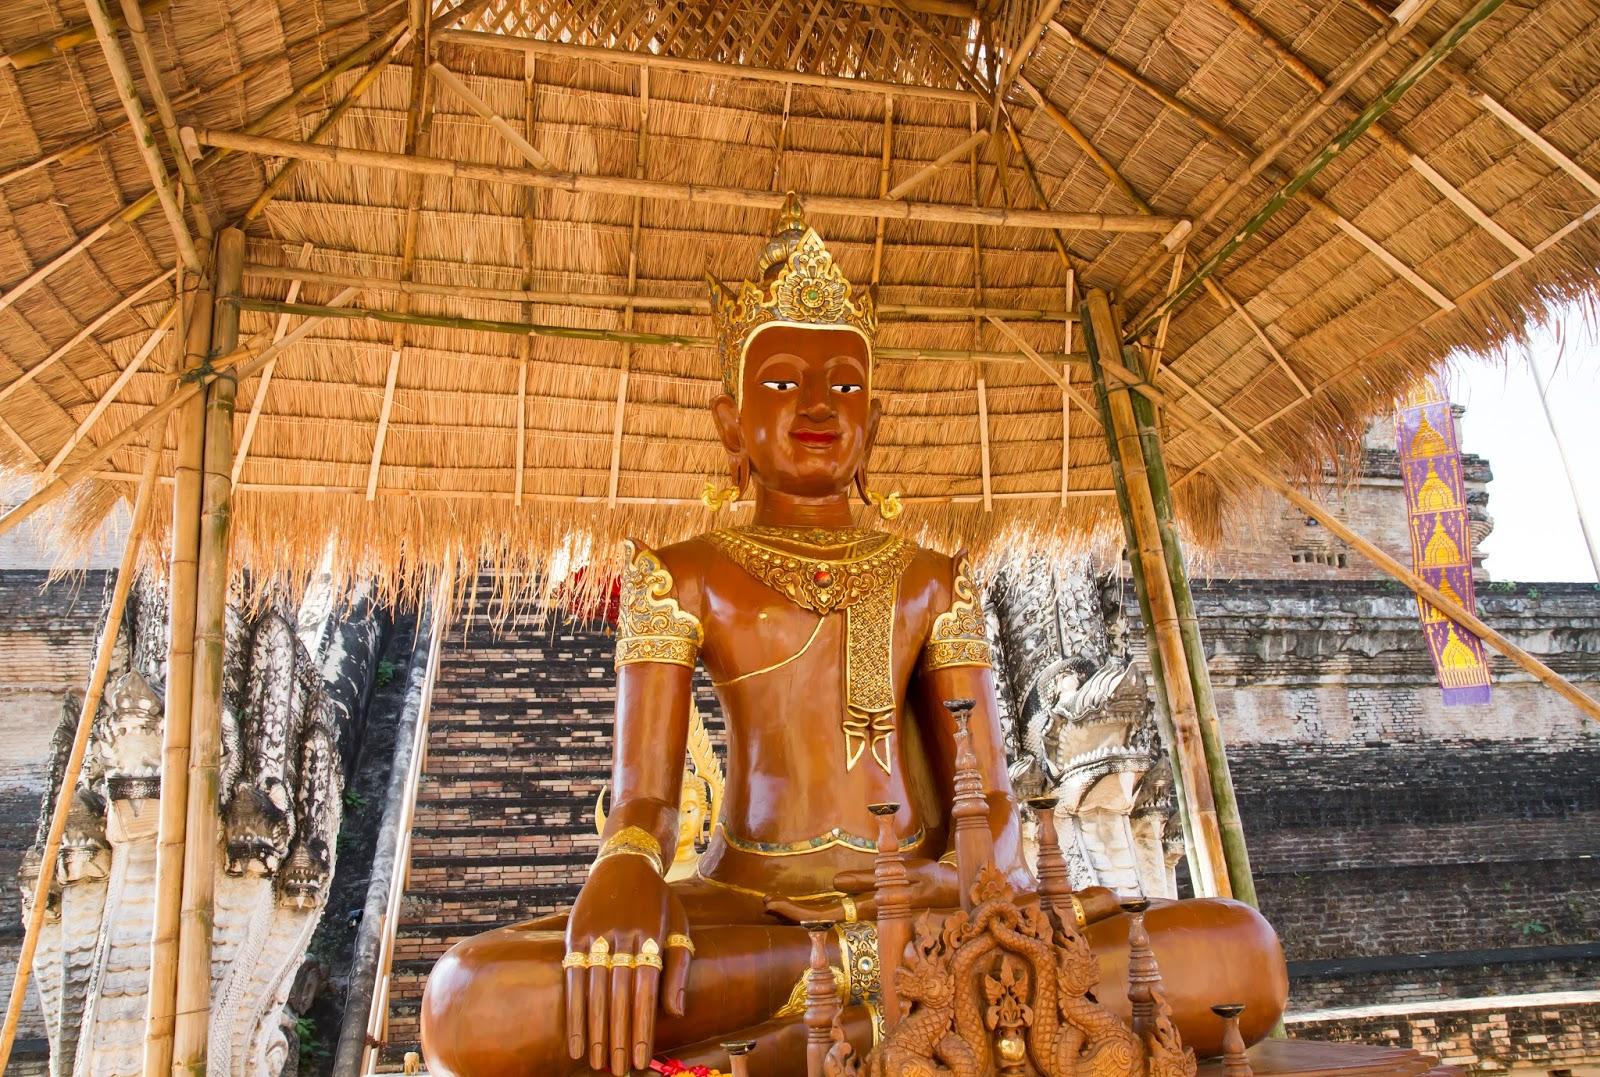 buddha at Wat Chedi Luang Worawihan in Chiang Mai, Thailand